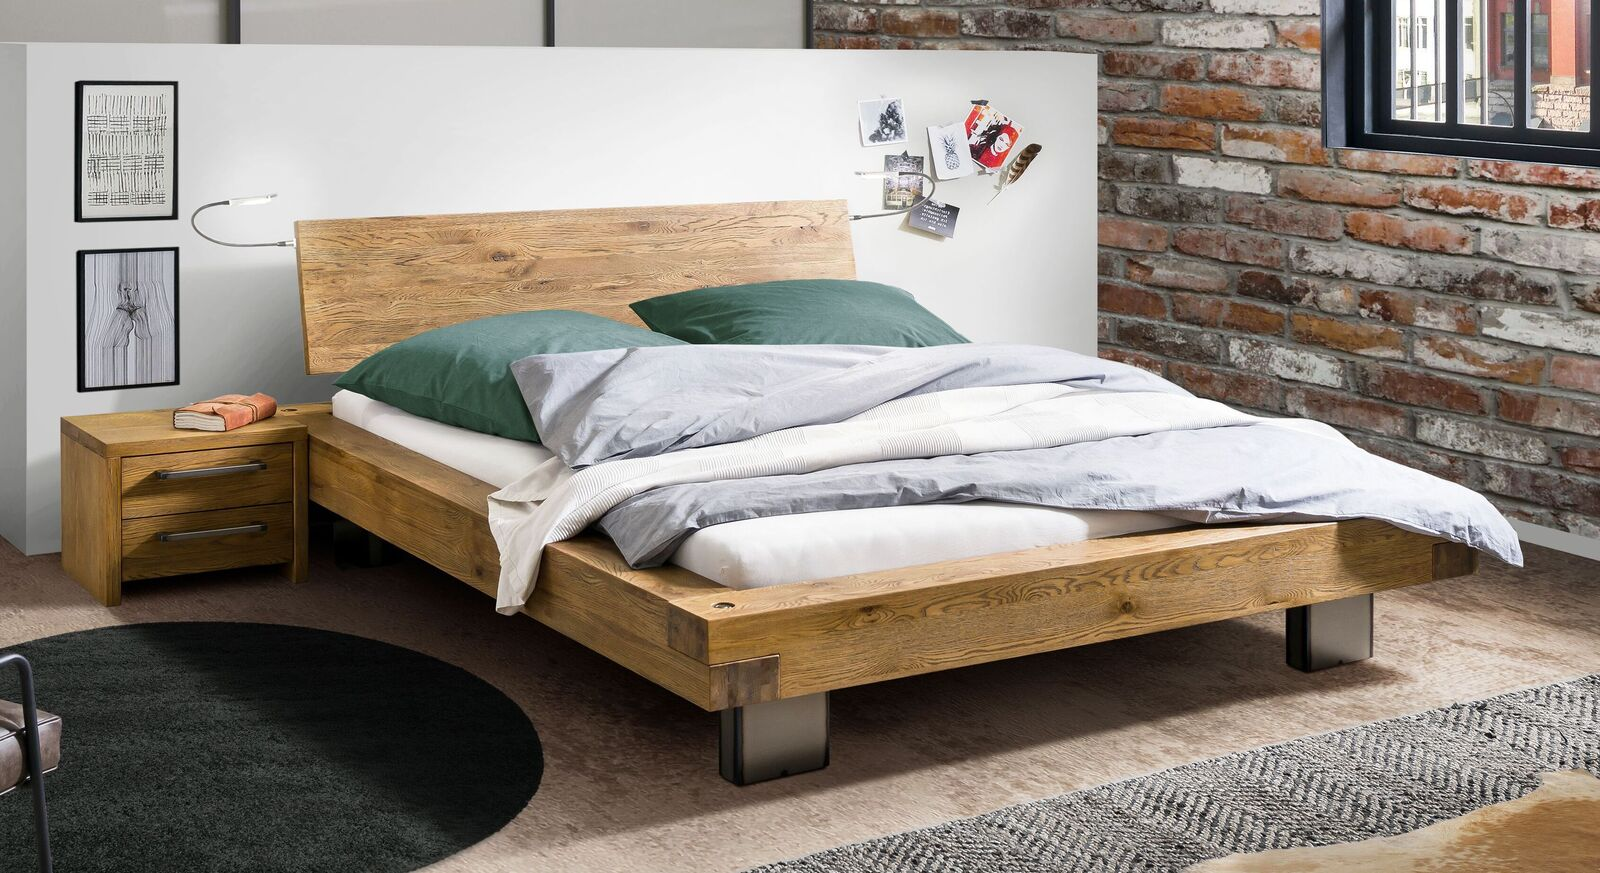 Bett Vilbert aus rustikalem Wildeichenholz